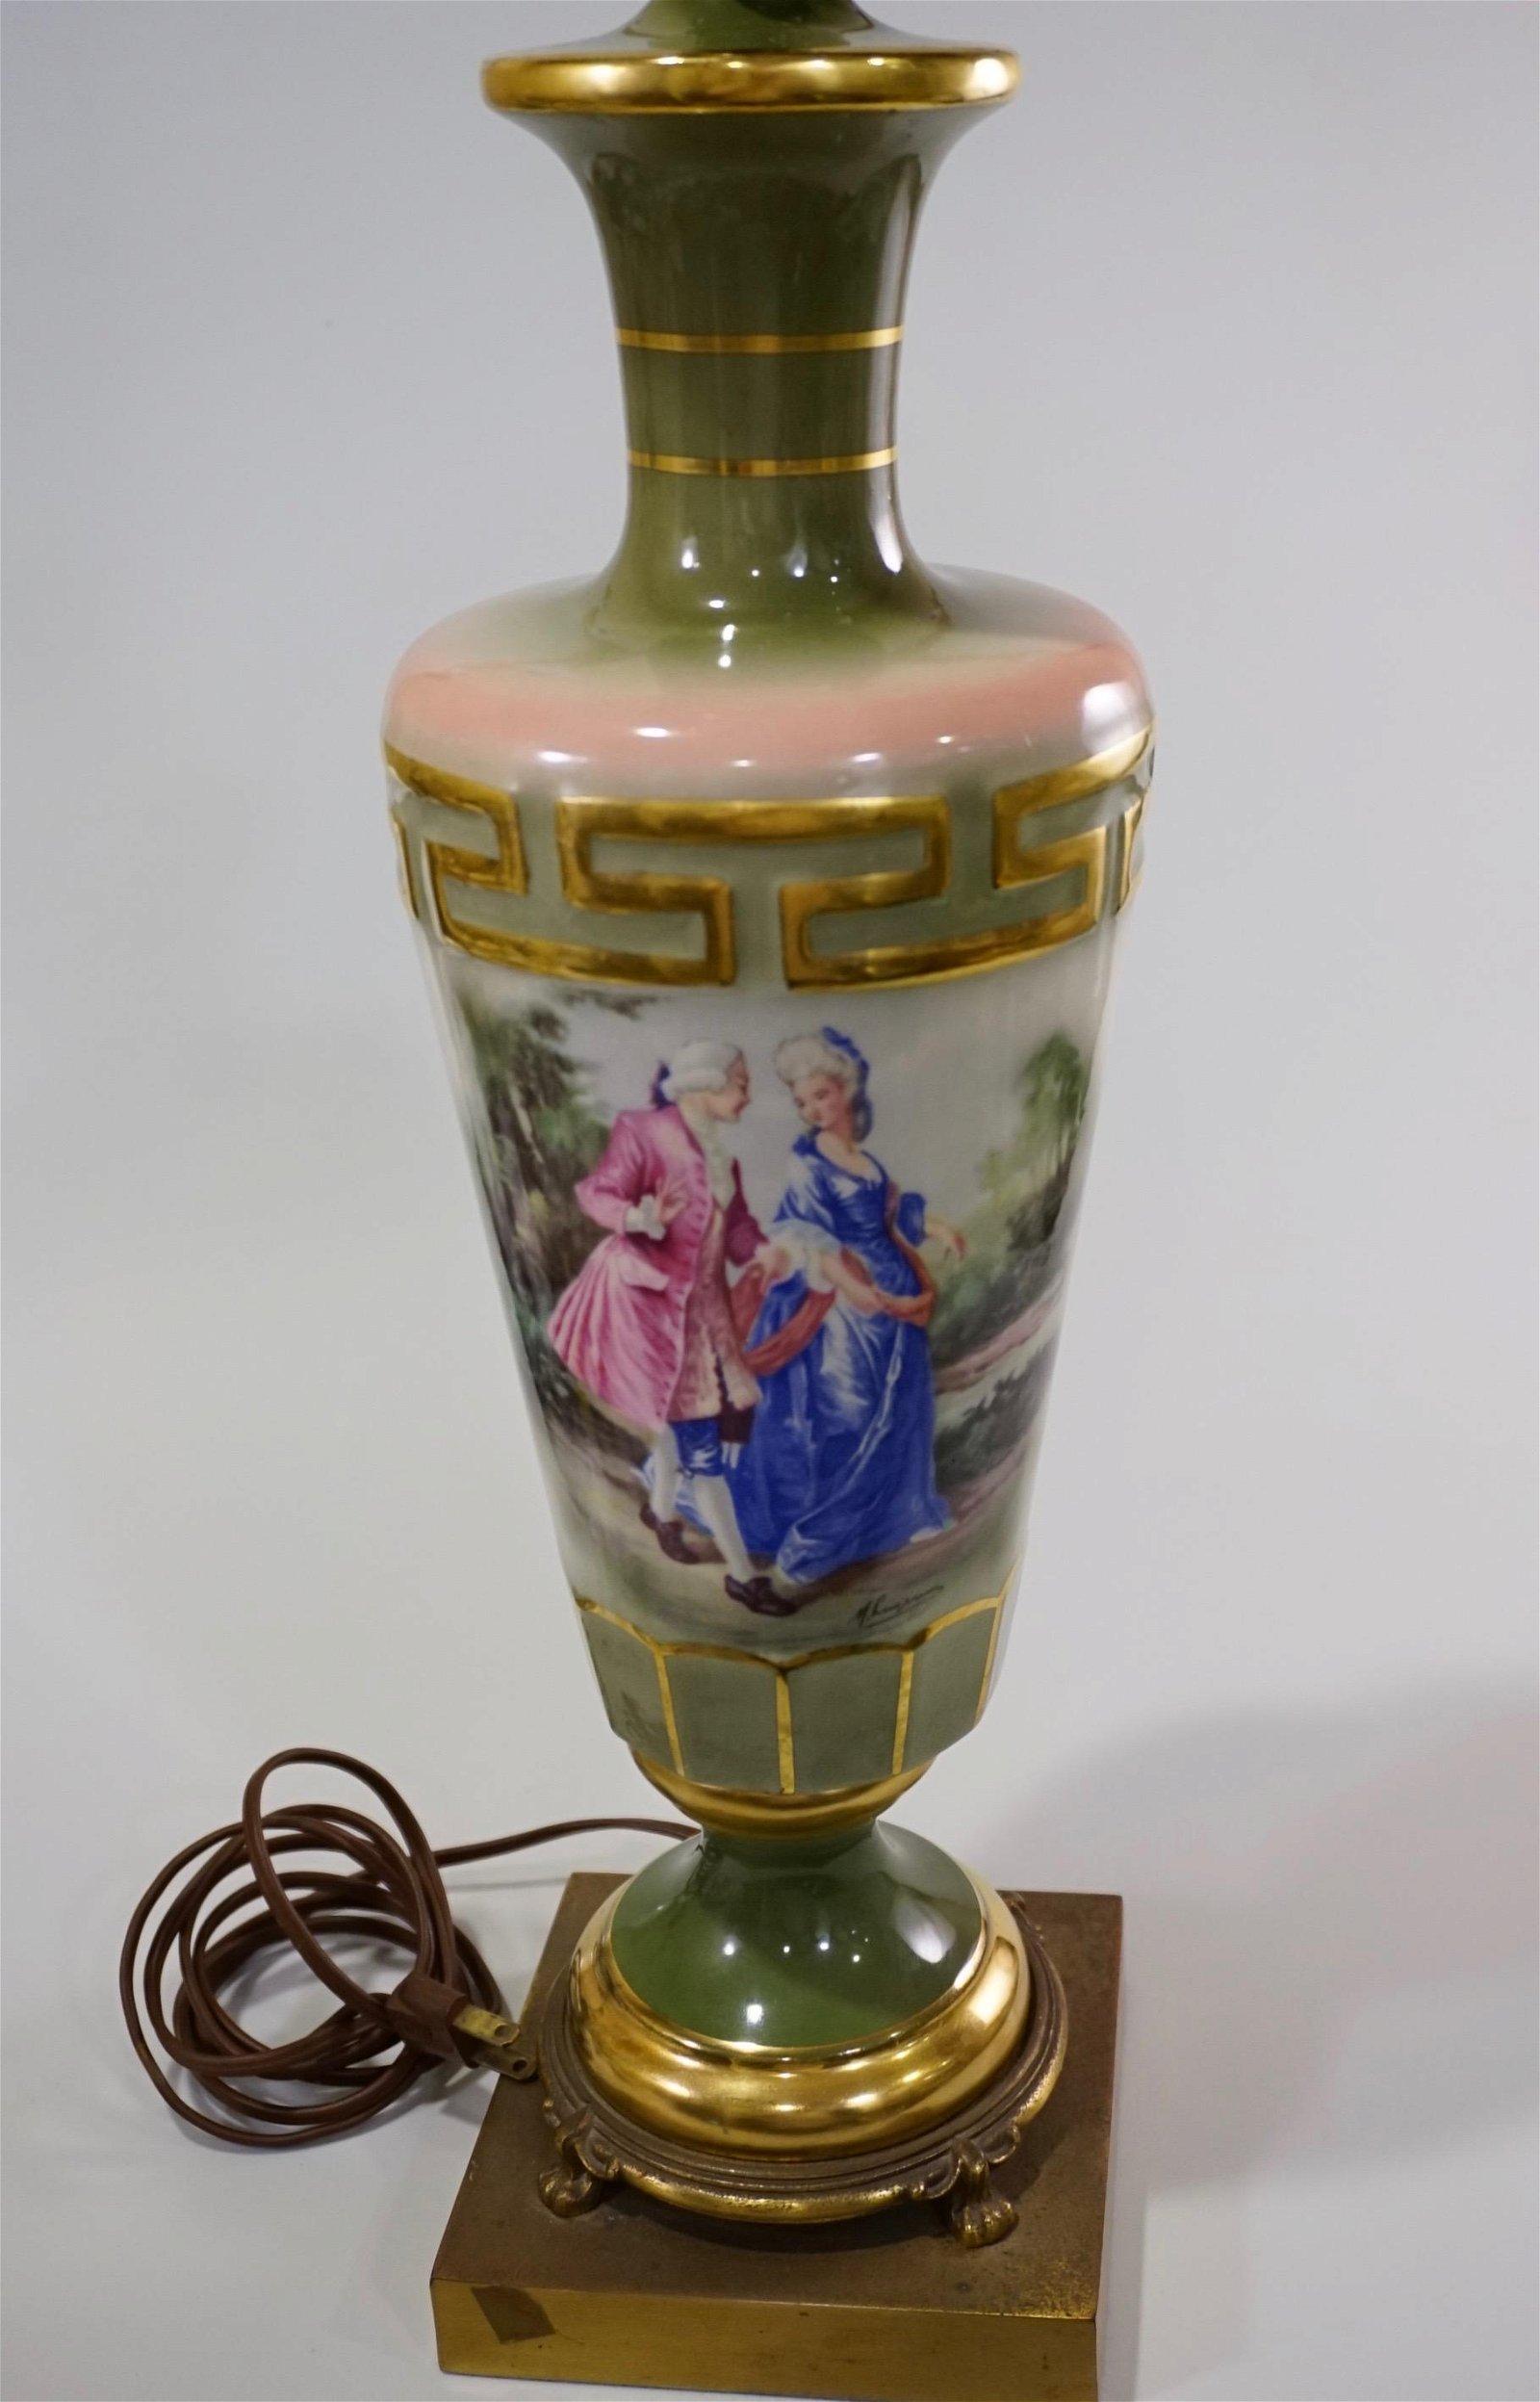 Vintage Ceramic Table Vase Lamp Elegant Couple Signed